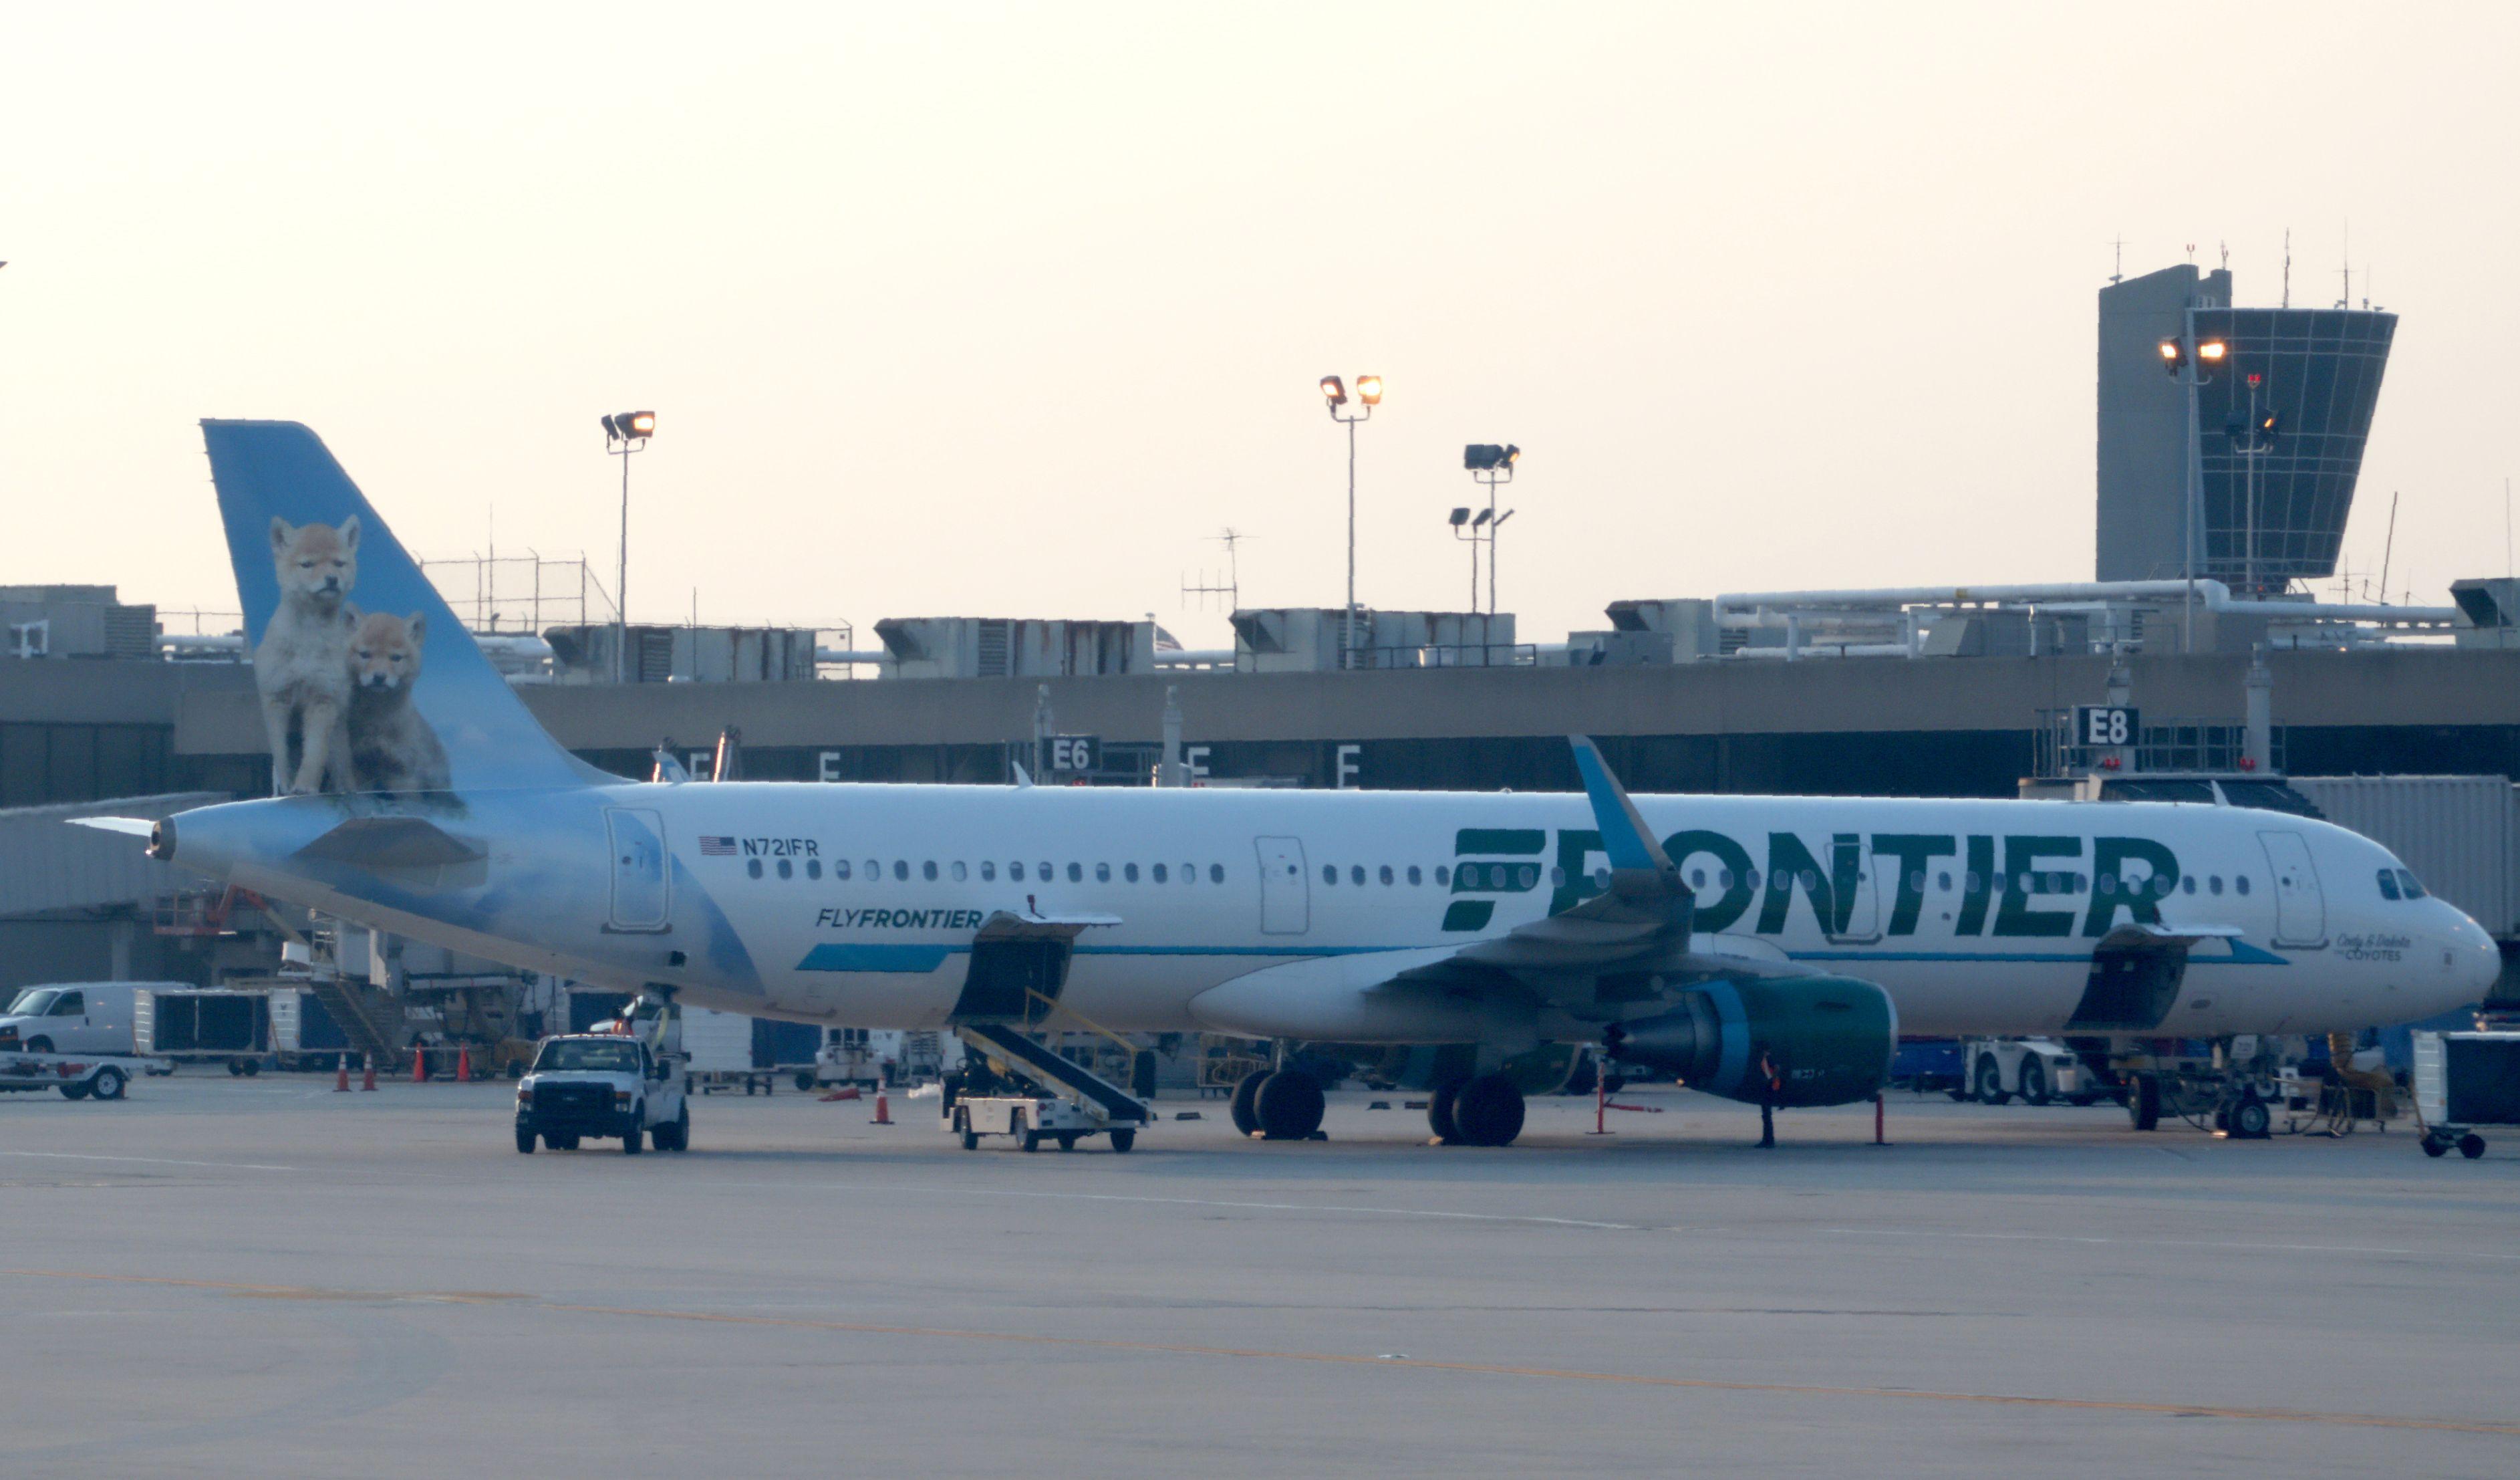 A Frontier Airlines jet at Philadelphia International Airport on June 1, 2018, in Philadelphia, Pennsylvania. (Photo by Daniel SLIM / AFP)        (Photo credit should read DANIEL SLIM/AFP/Getty Images)